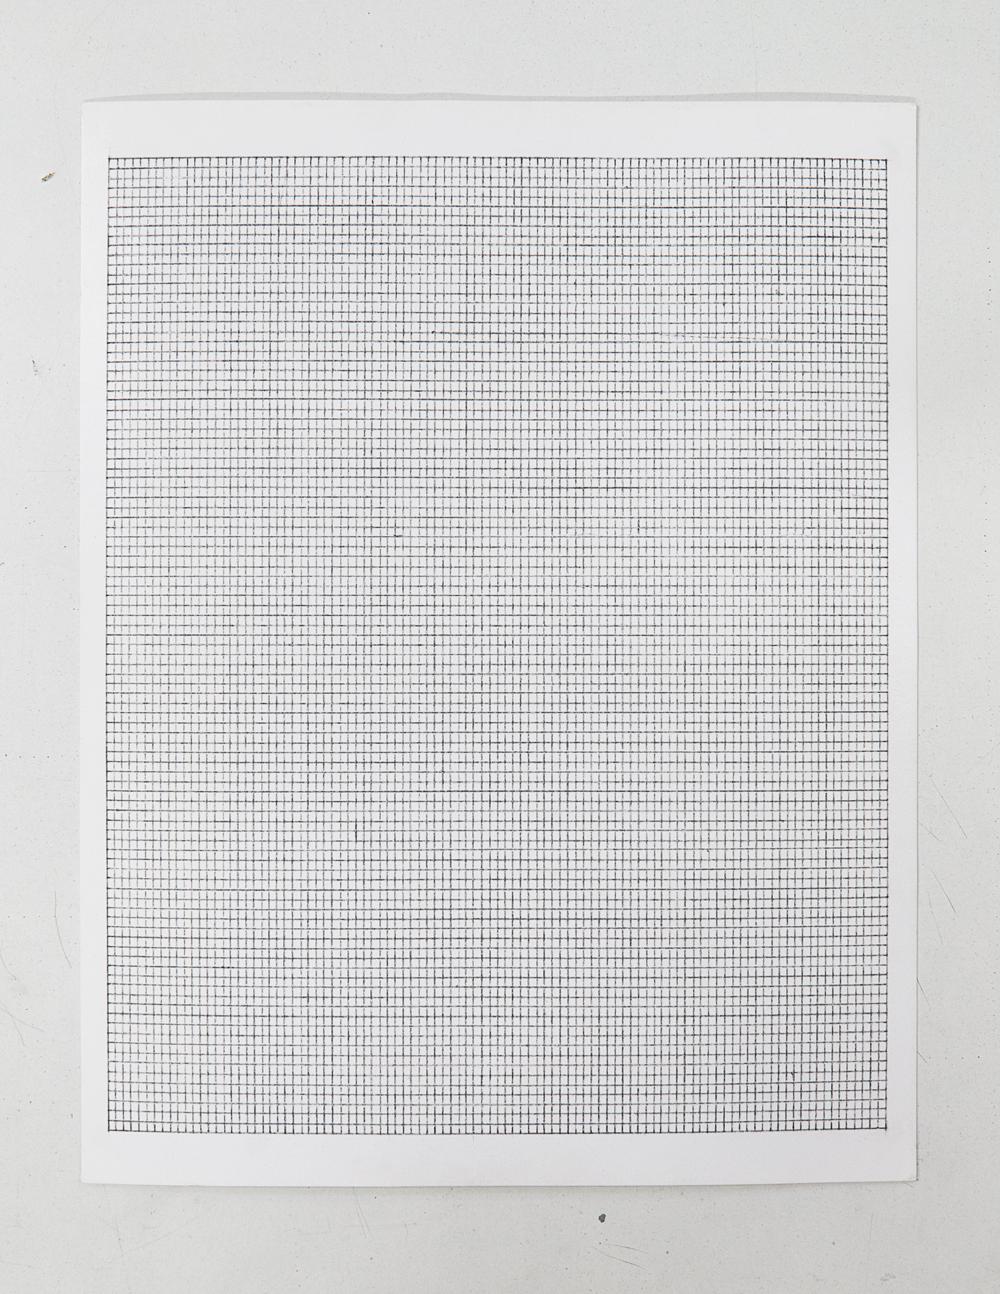 (PRISONTIME/PRISONINME: Transition to Metric) 2mm x 2.5mm on 20cm x 25cm,  2014   Pencil on semi-matte inkjet fiber paper, 8.5 in.x 11 in.